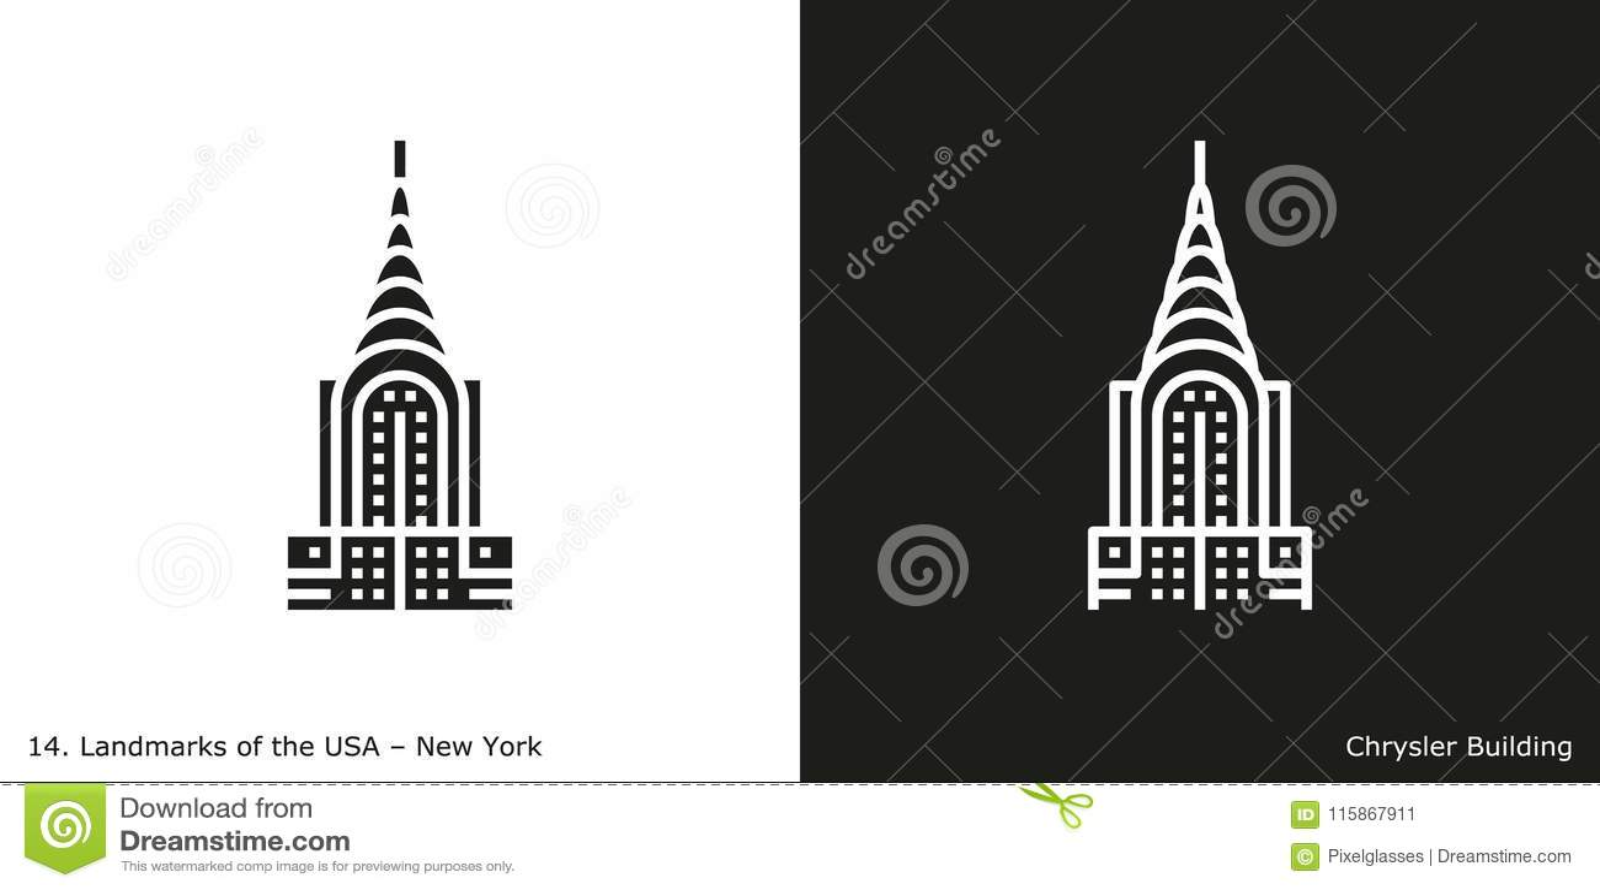 Chrysler byggnadssymbol